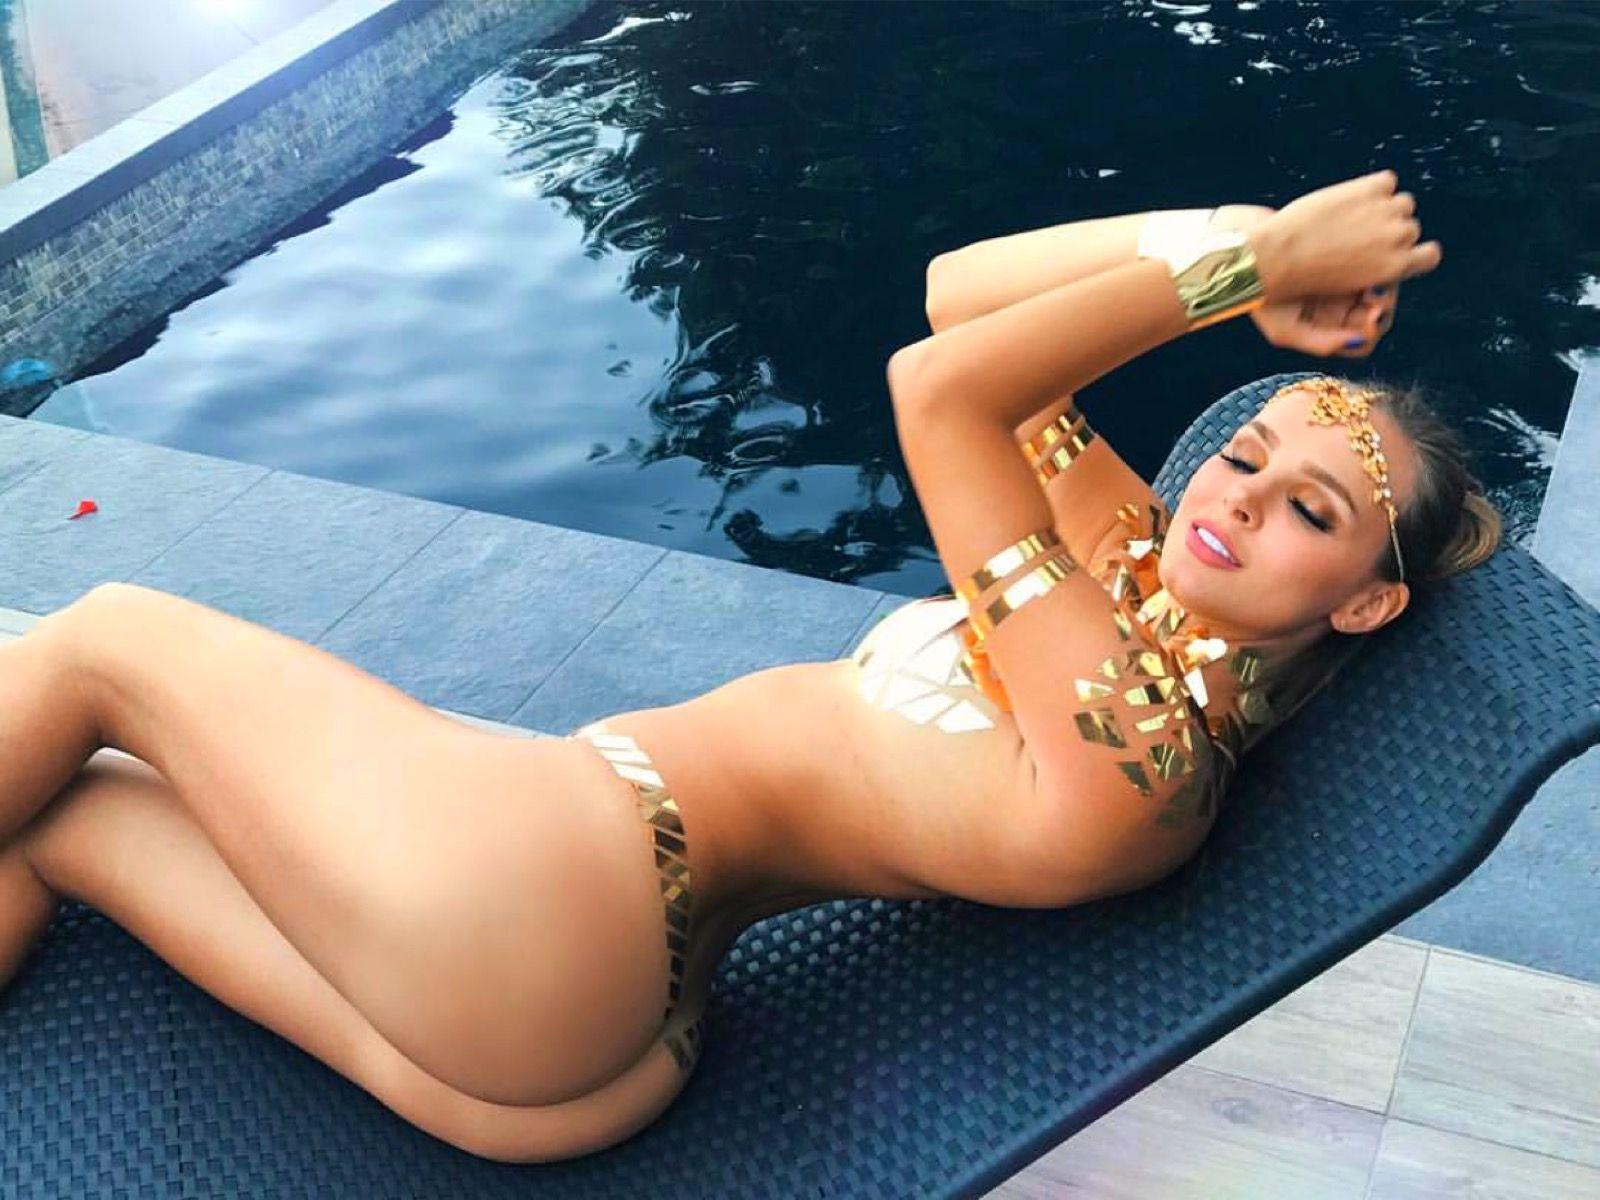 Celebrity Nicolle Radzivil nudes (41 photos), Pussy, Is a cute, Instagram, lingerie 2015